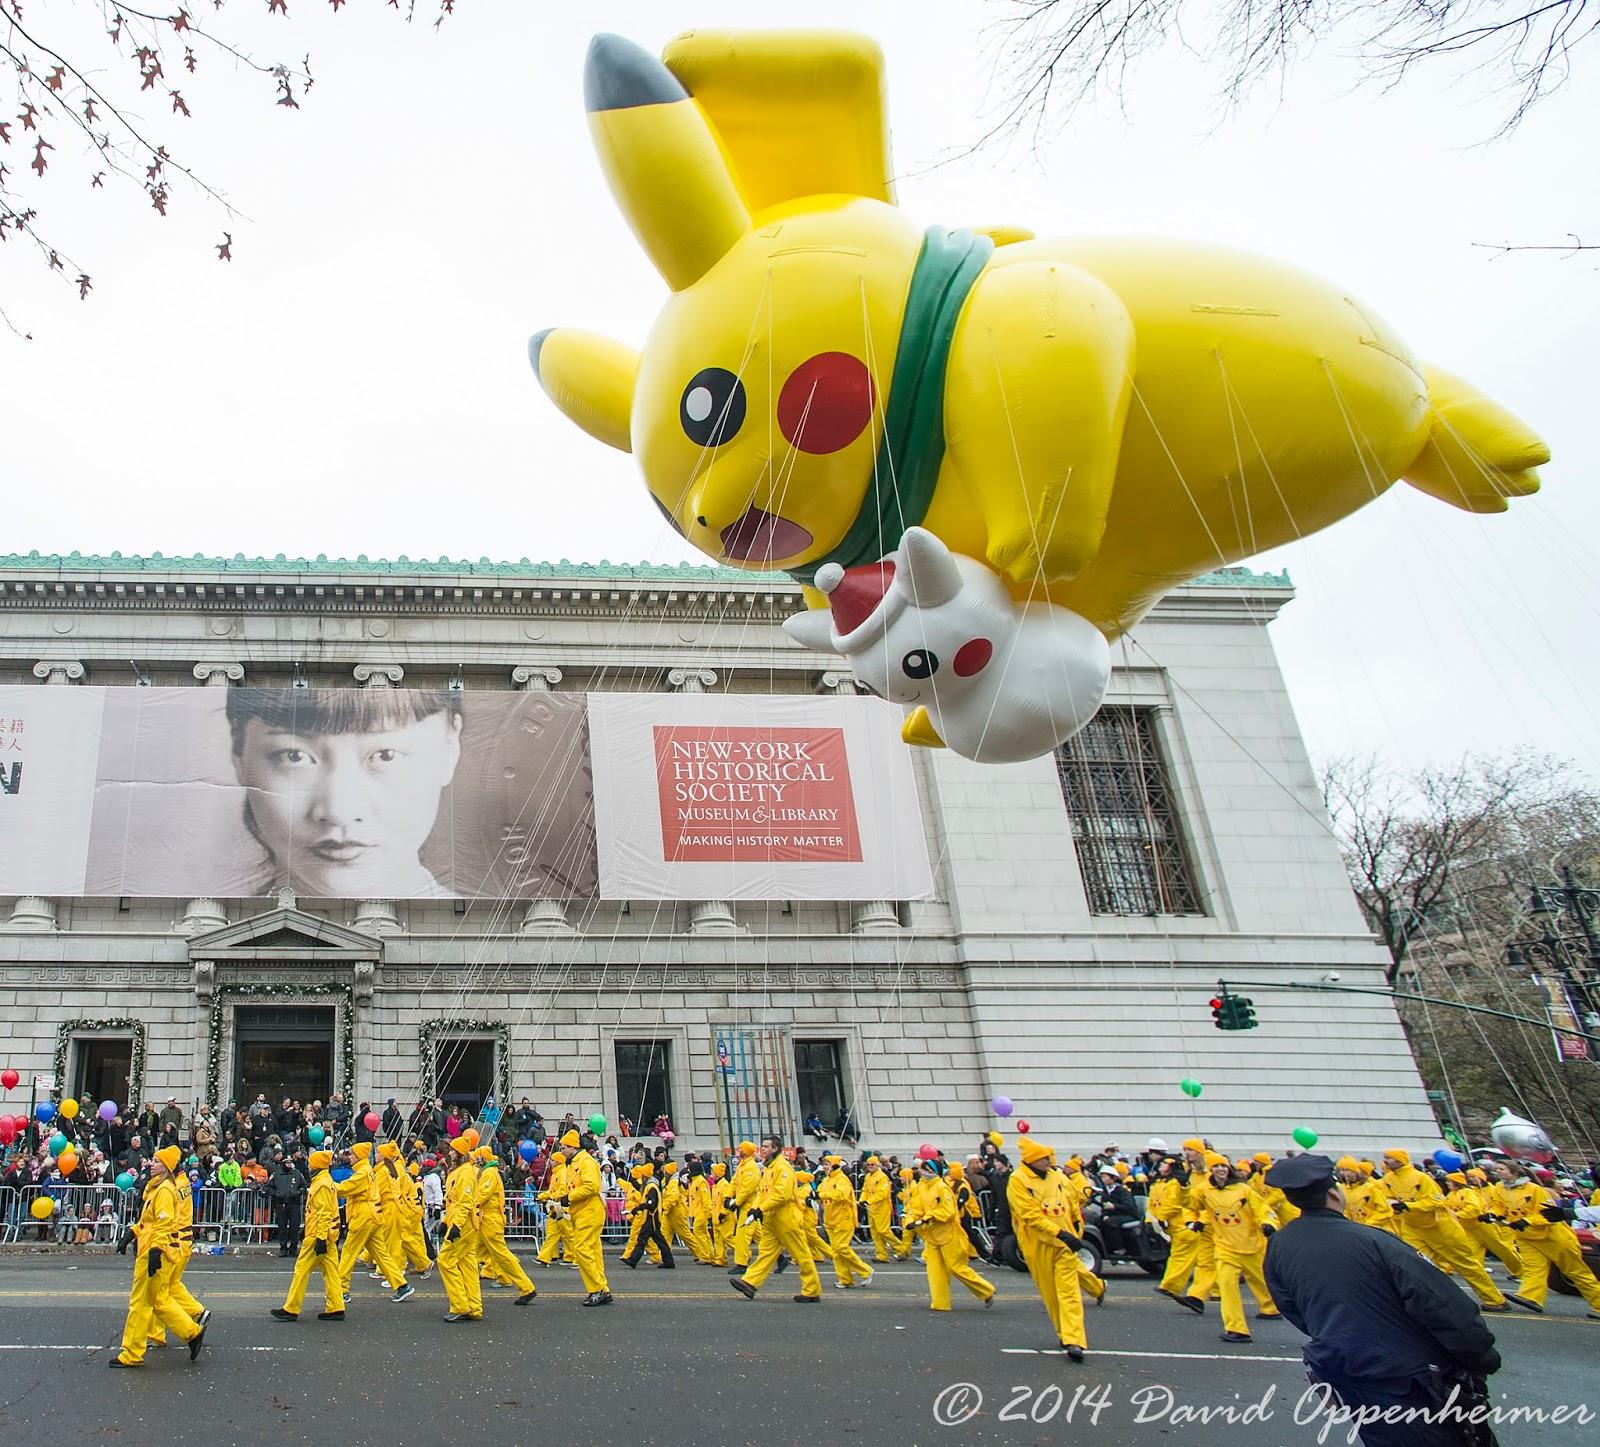 Pikachu by The Pokemon Company International